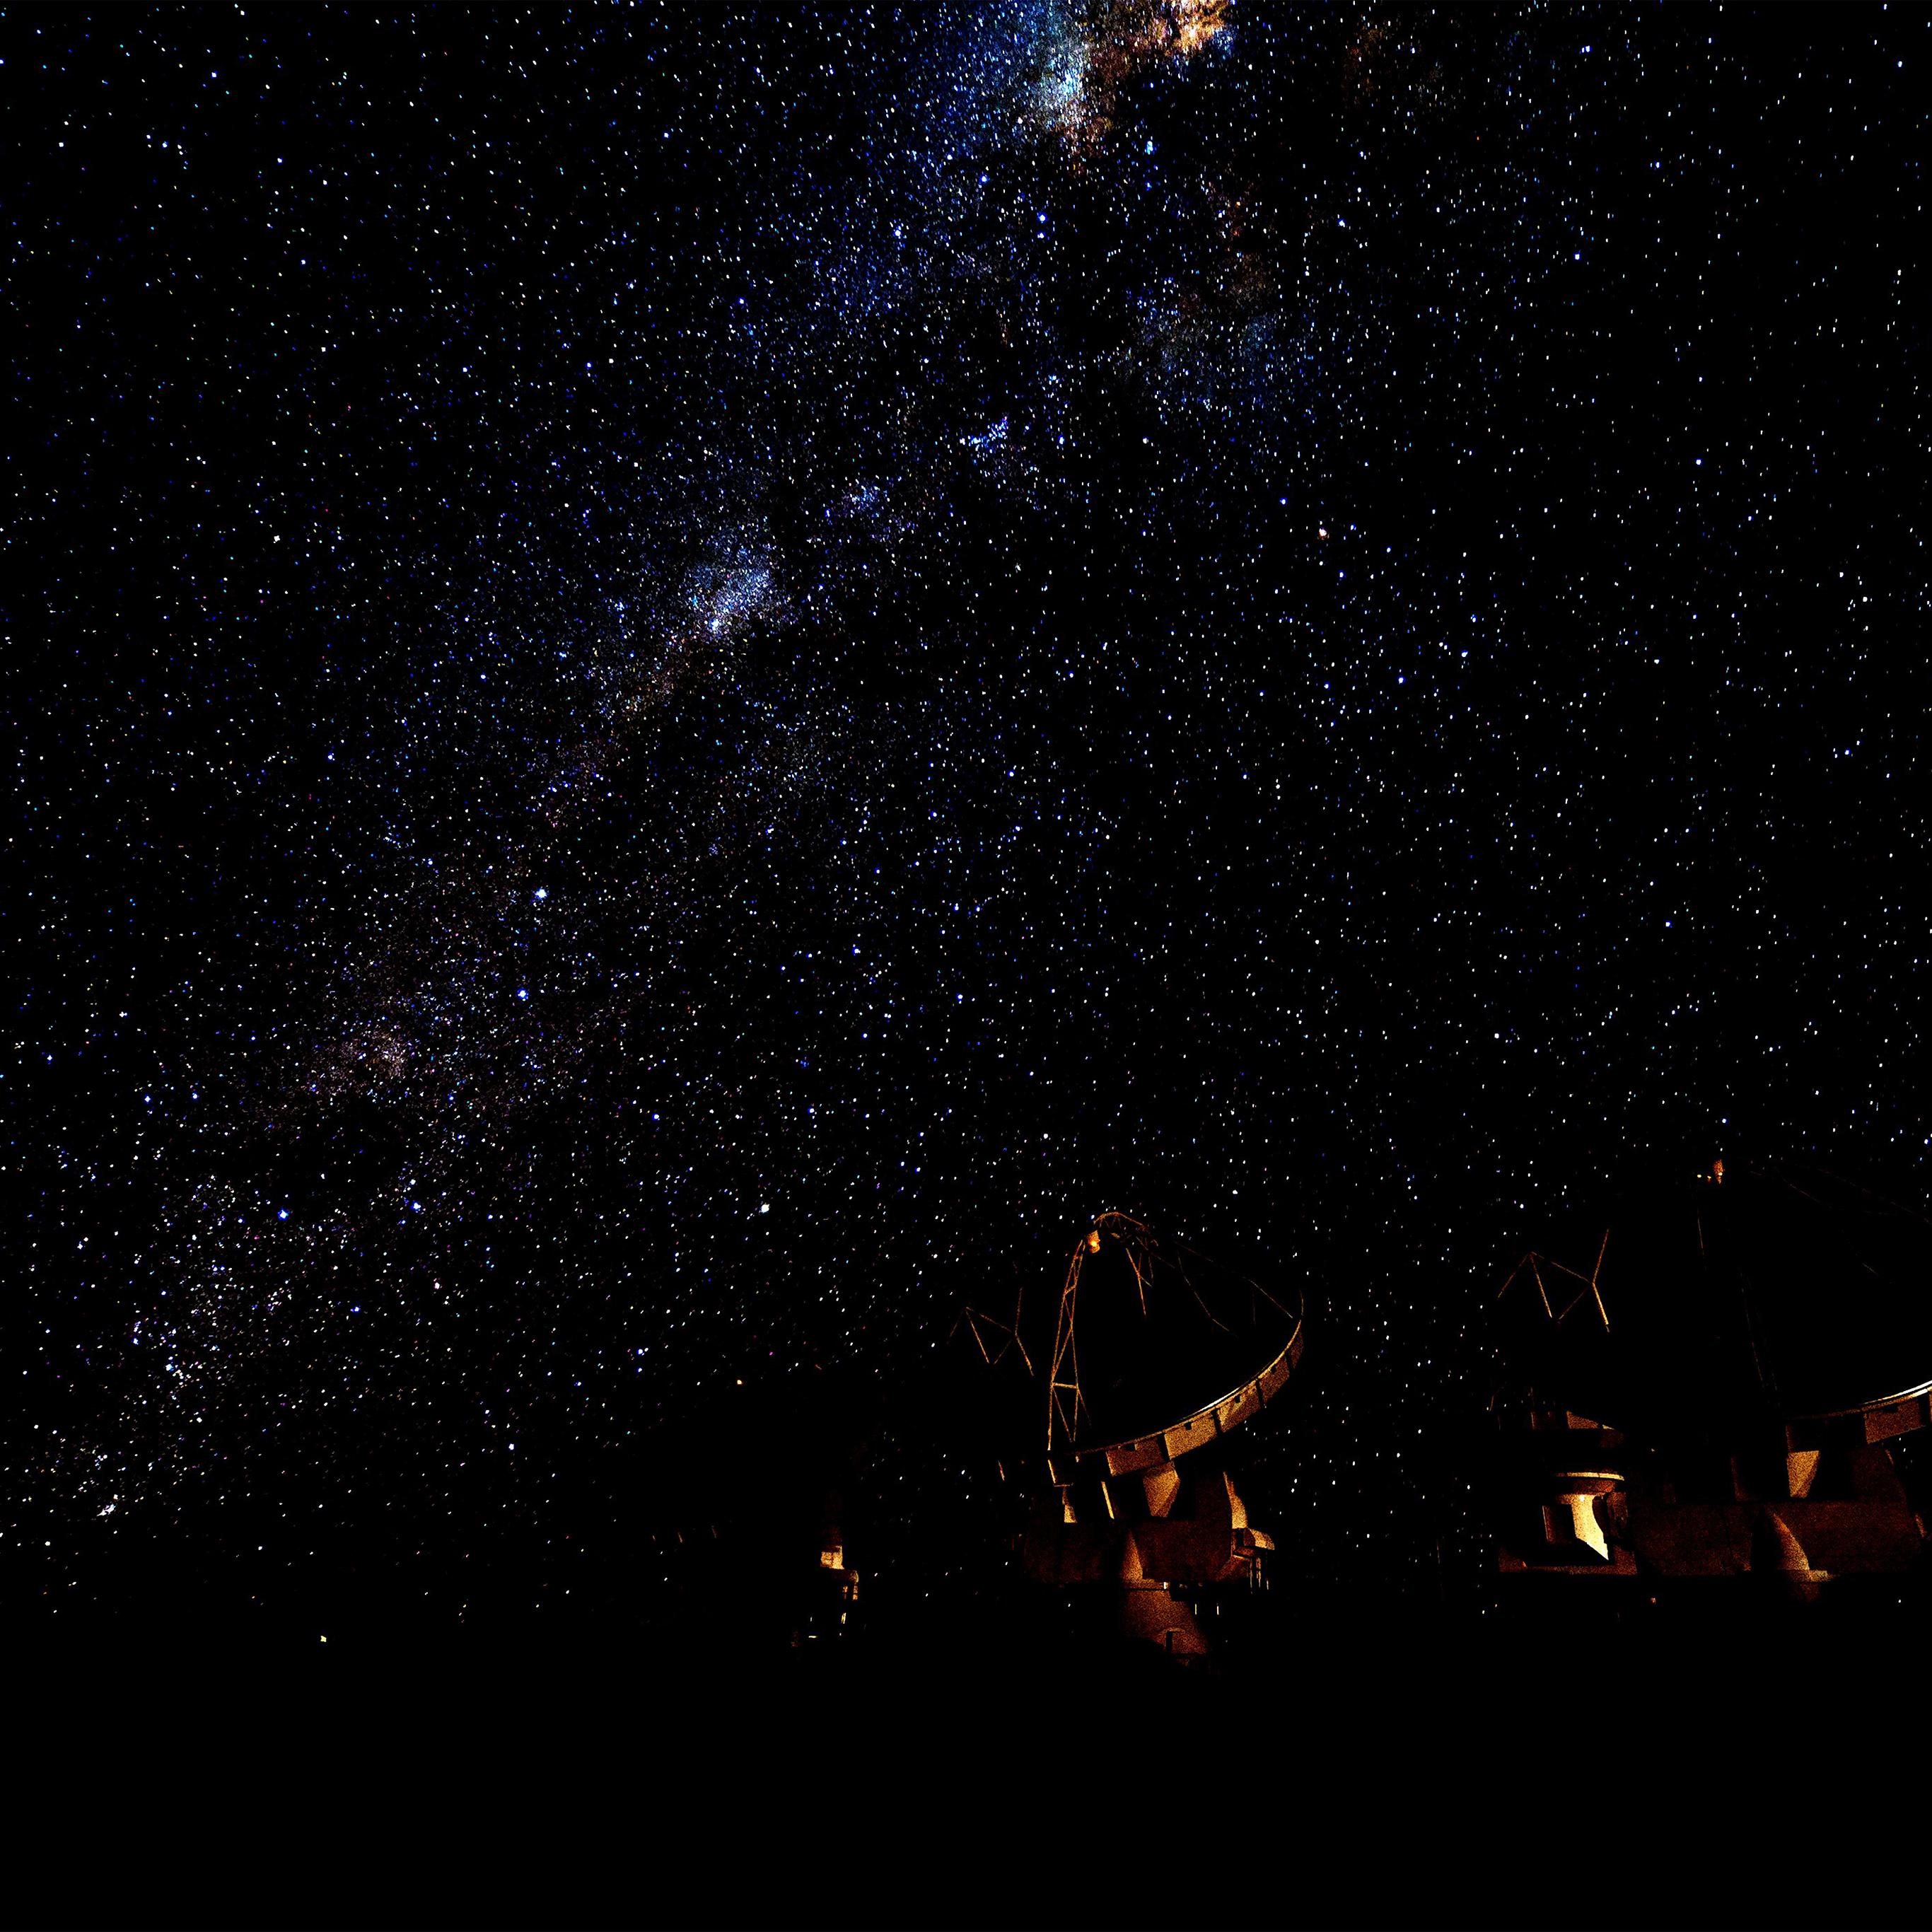 | mw41-space-dark-star-nature-black-sky